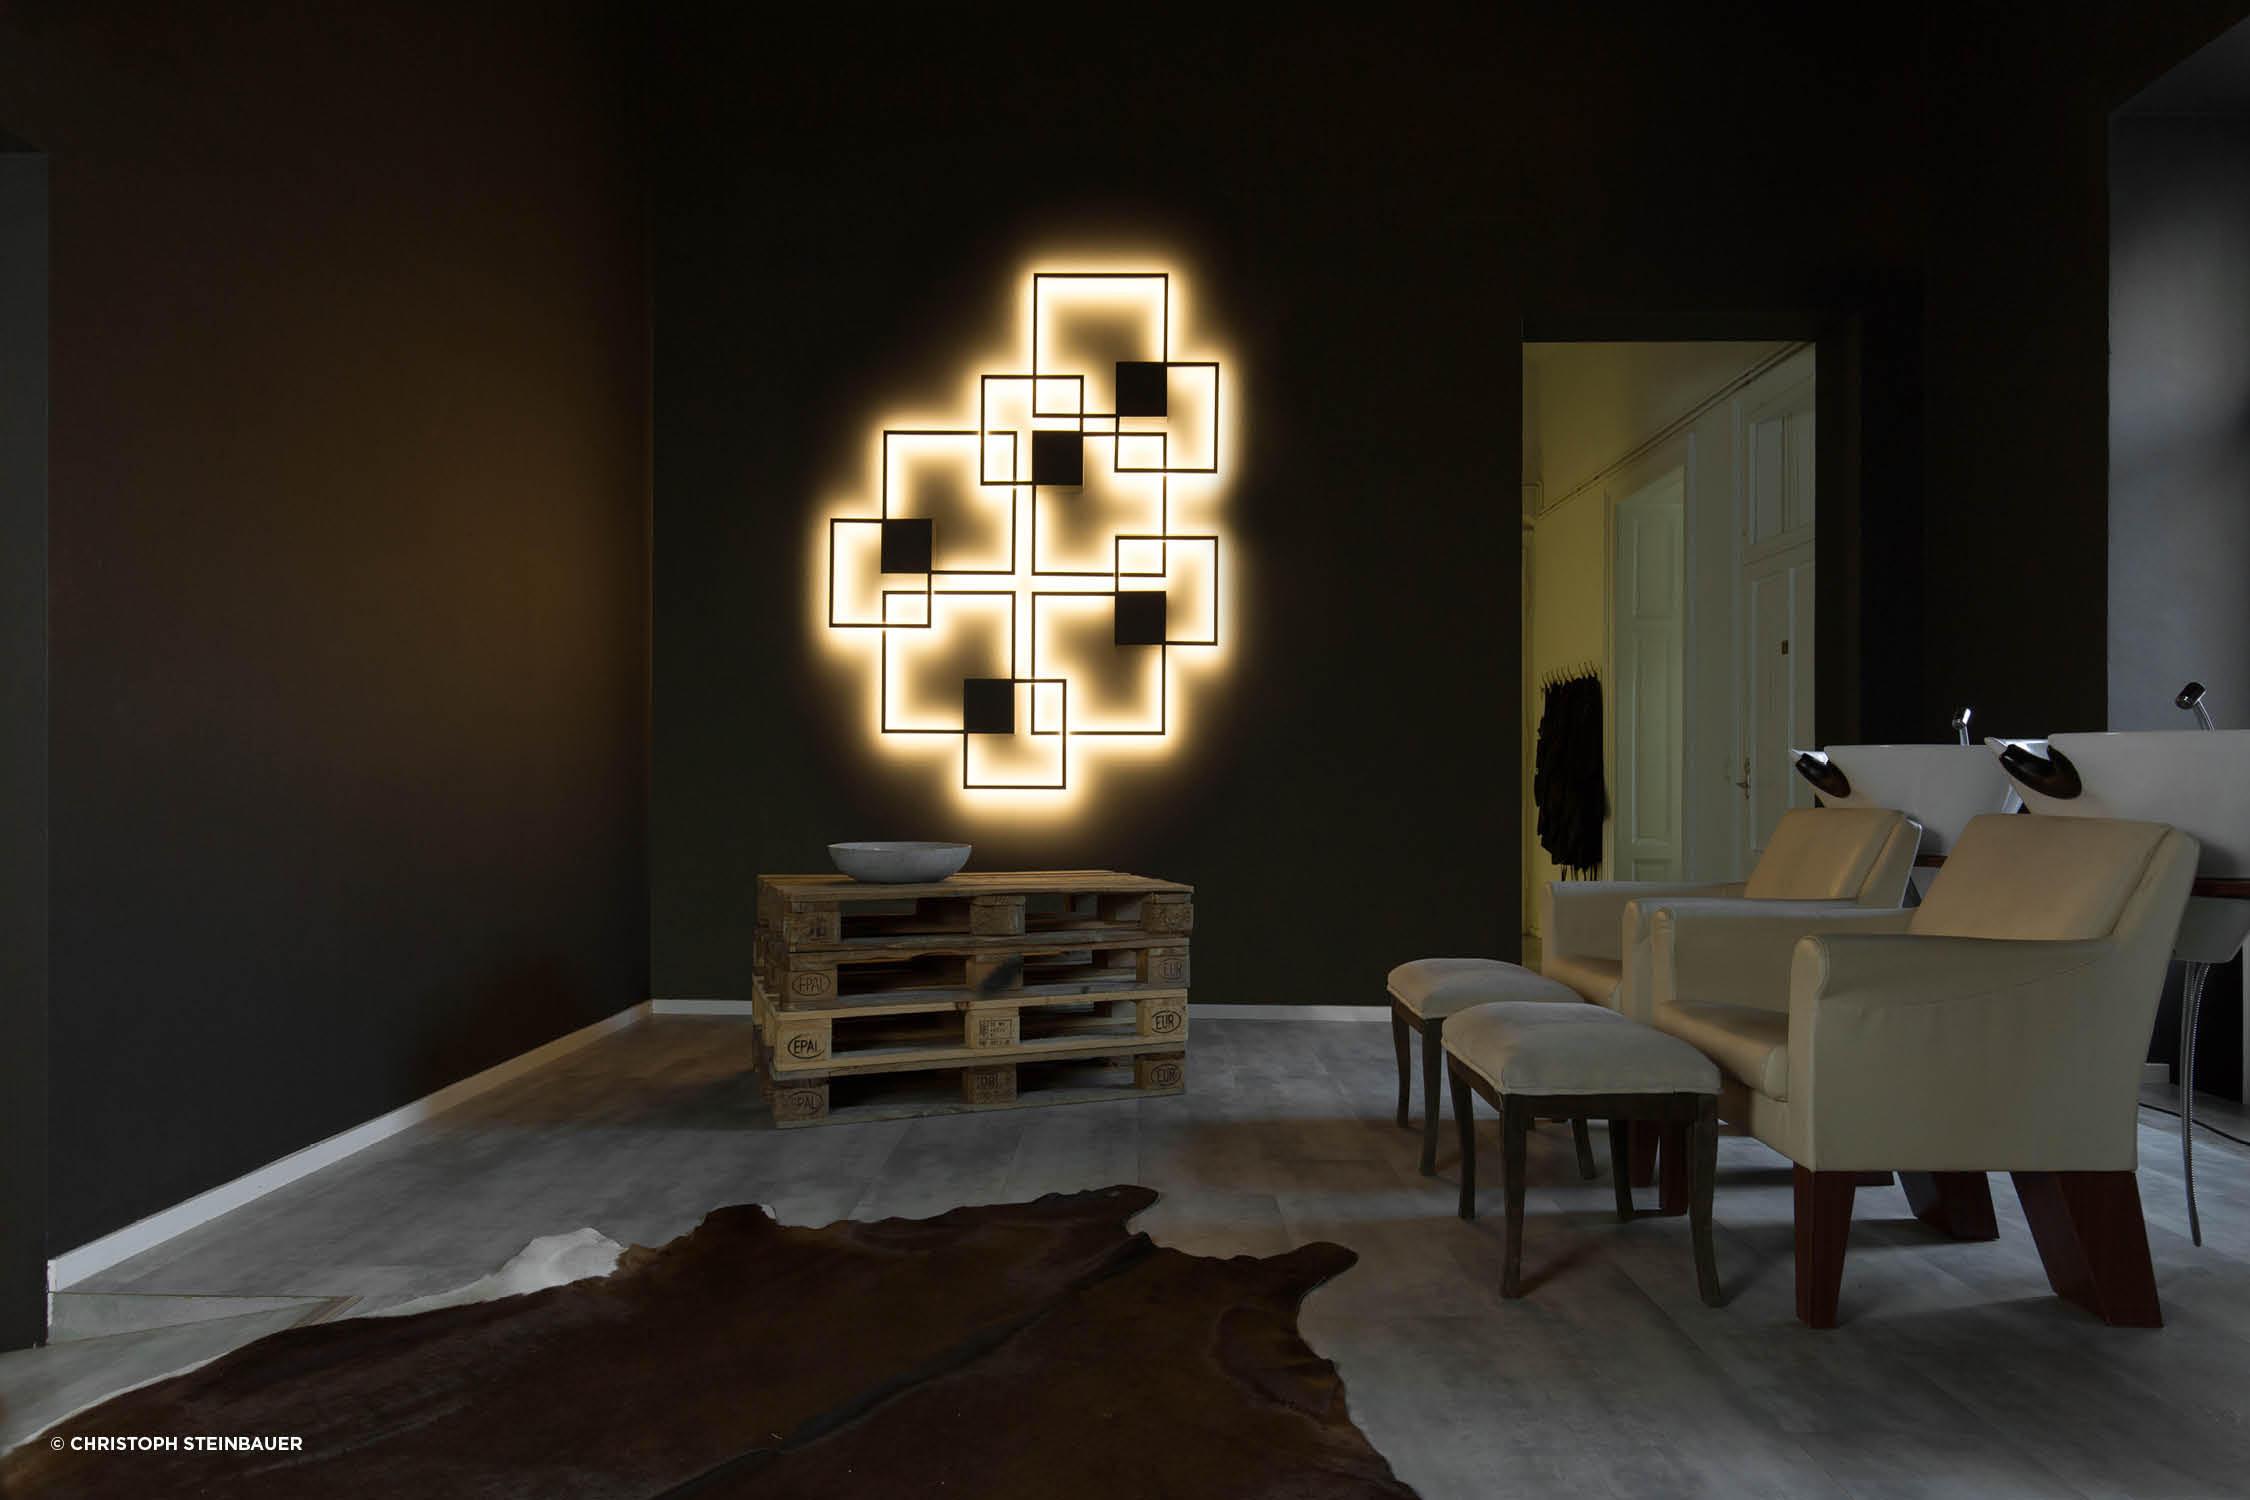 venn 1 0 general lighting from wever ducr architonic. Black Bedroom Furniture Sets. Home Design Ideas